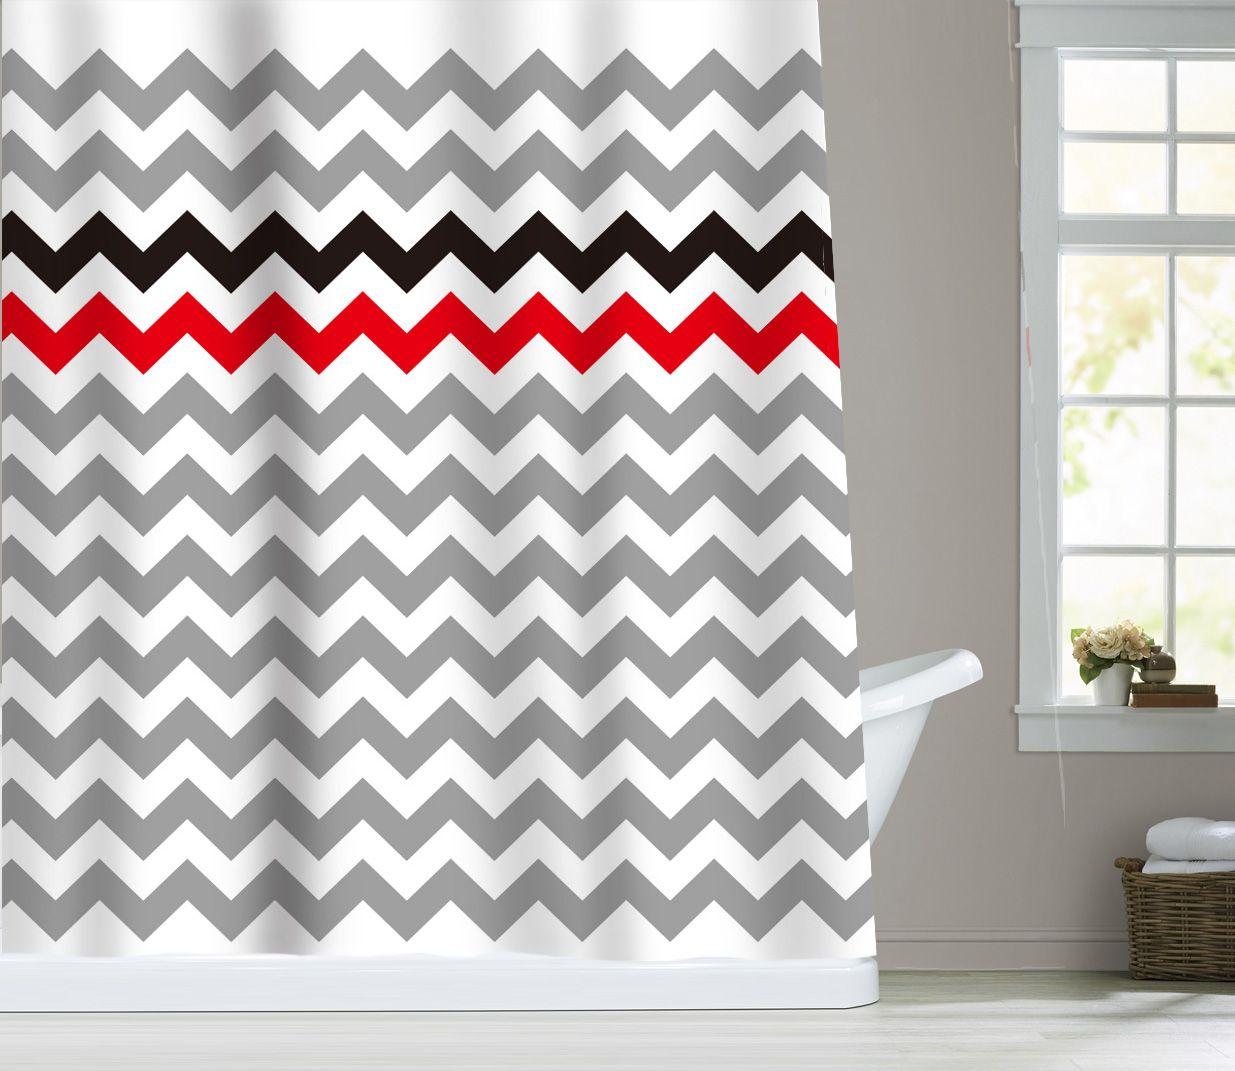 Zigzag Stripes Chevron Fabric Bathroom Shower Curtain Red Black Gray ...